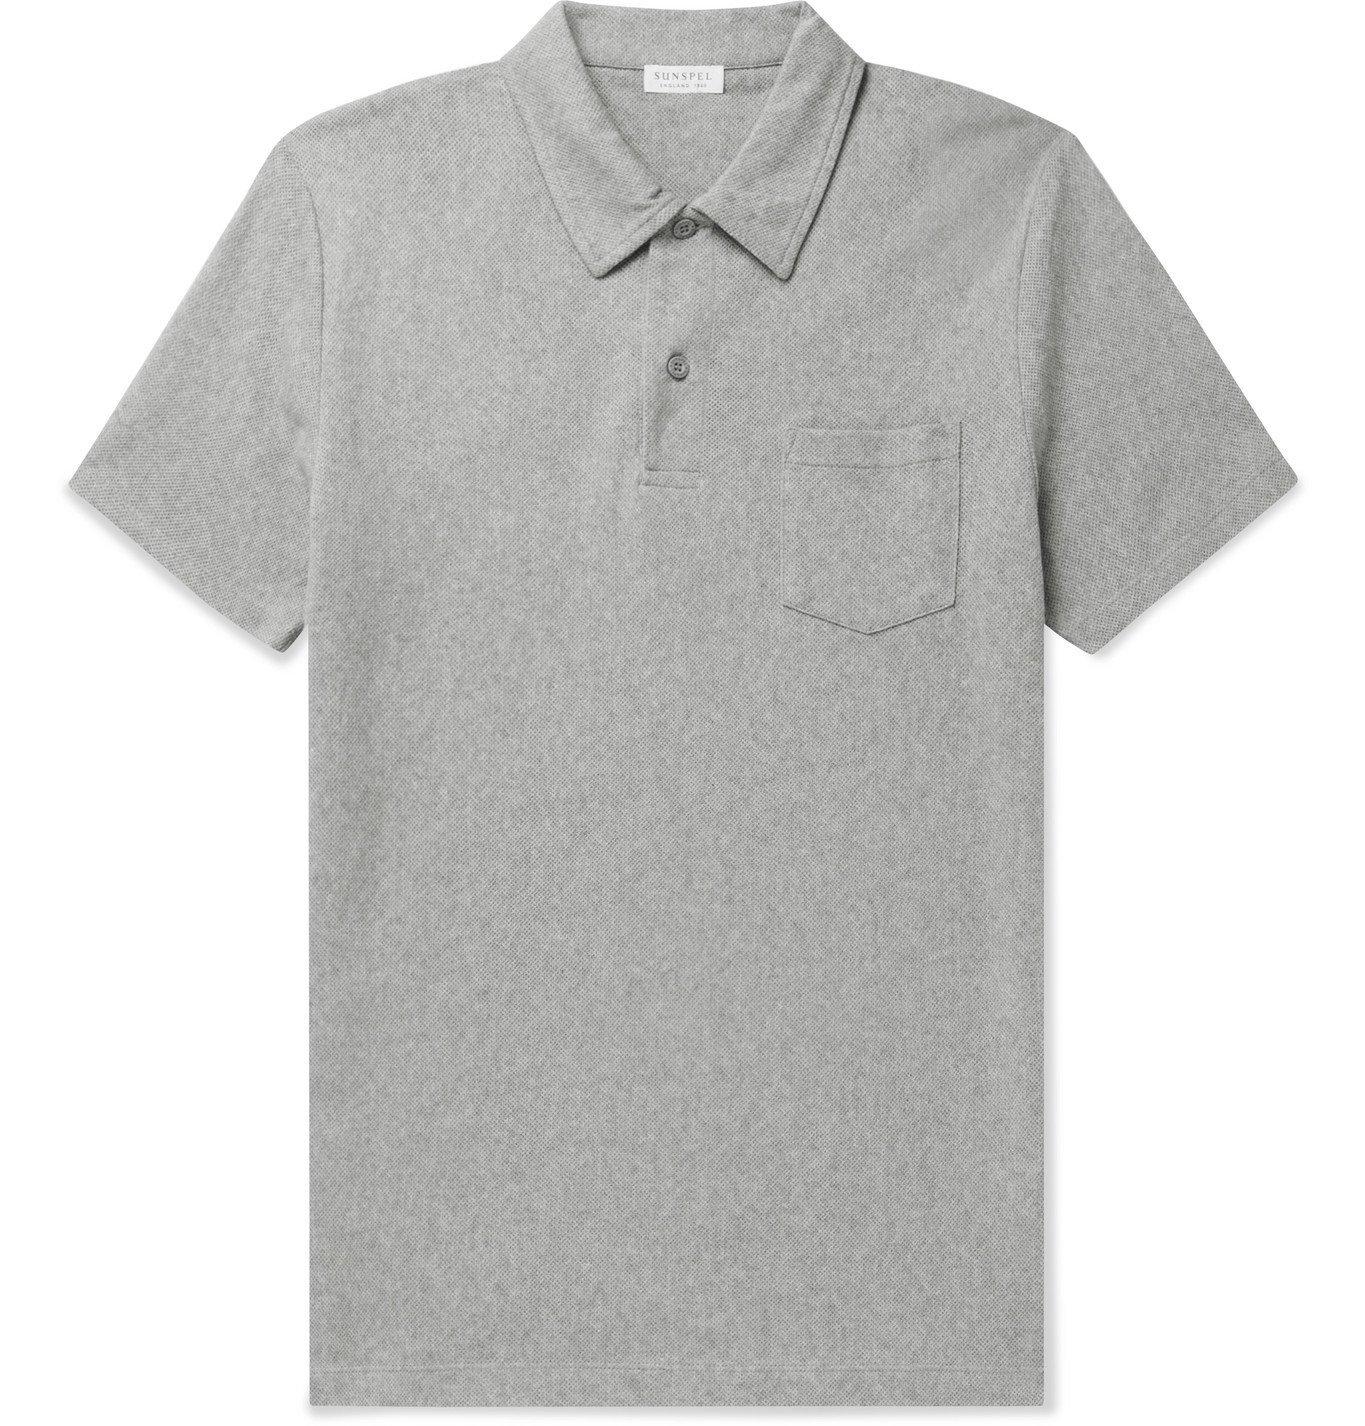 Sunspel - Riviera Slim-Fit Cotton-Mesh Polo Shirt - Gray